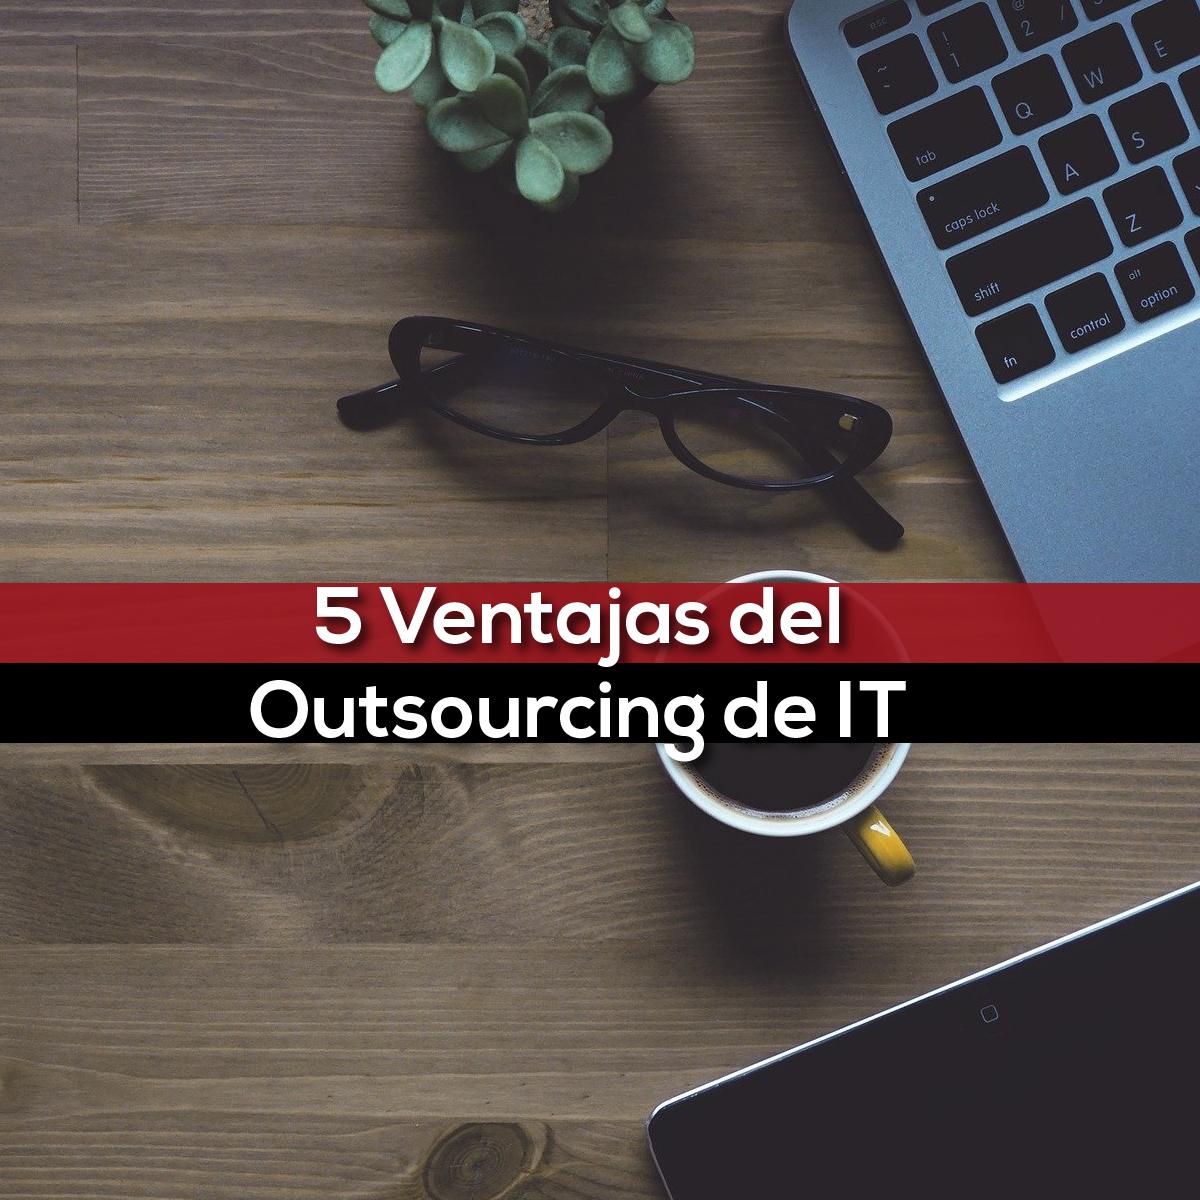 5 Ventajas Del Outsourcing De IT